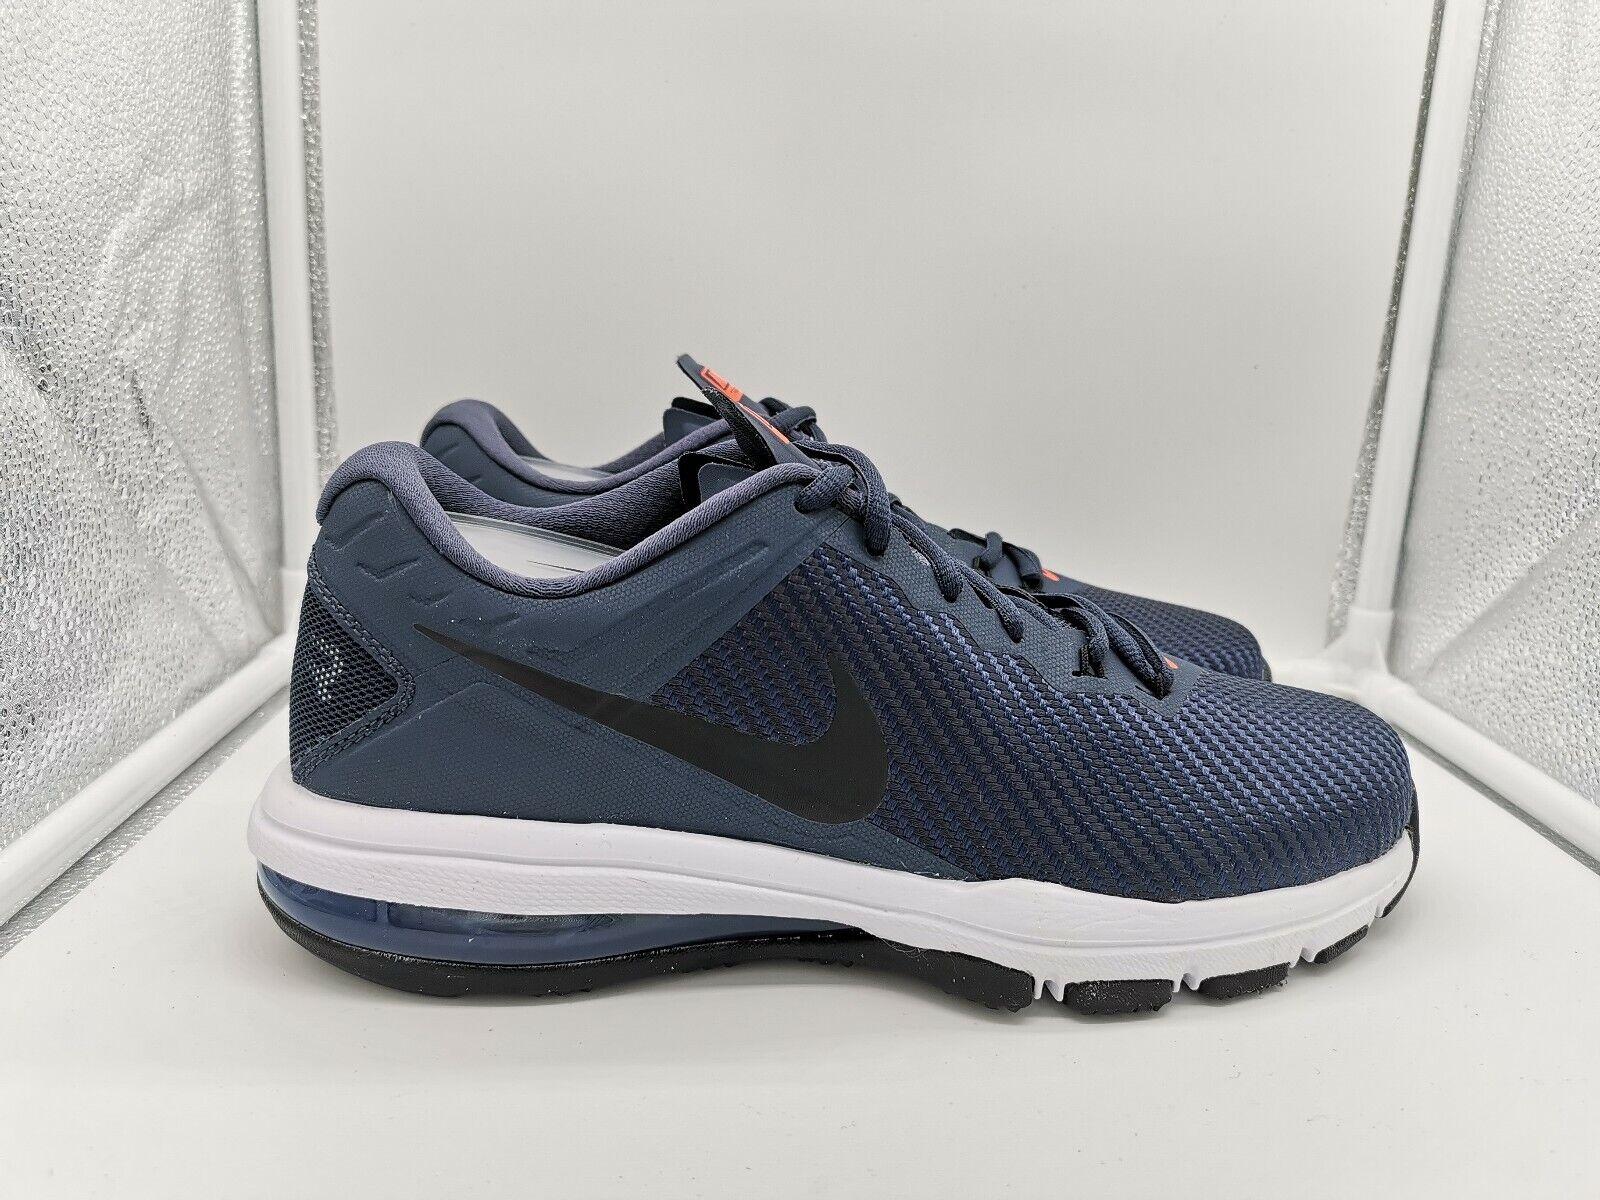 Nike Air Max Full Ride Tr 1.5 Reino Unido 8.5 Trueno Azul Negro 869633-406